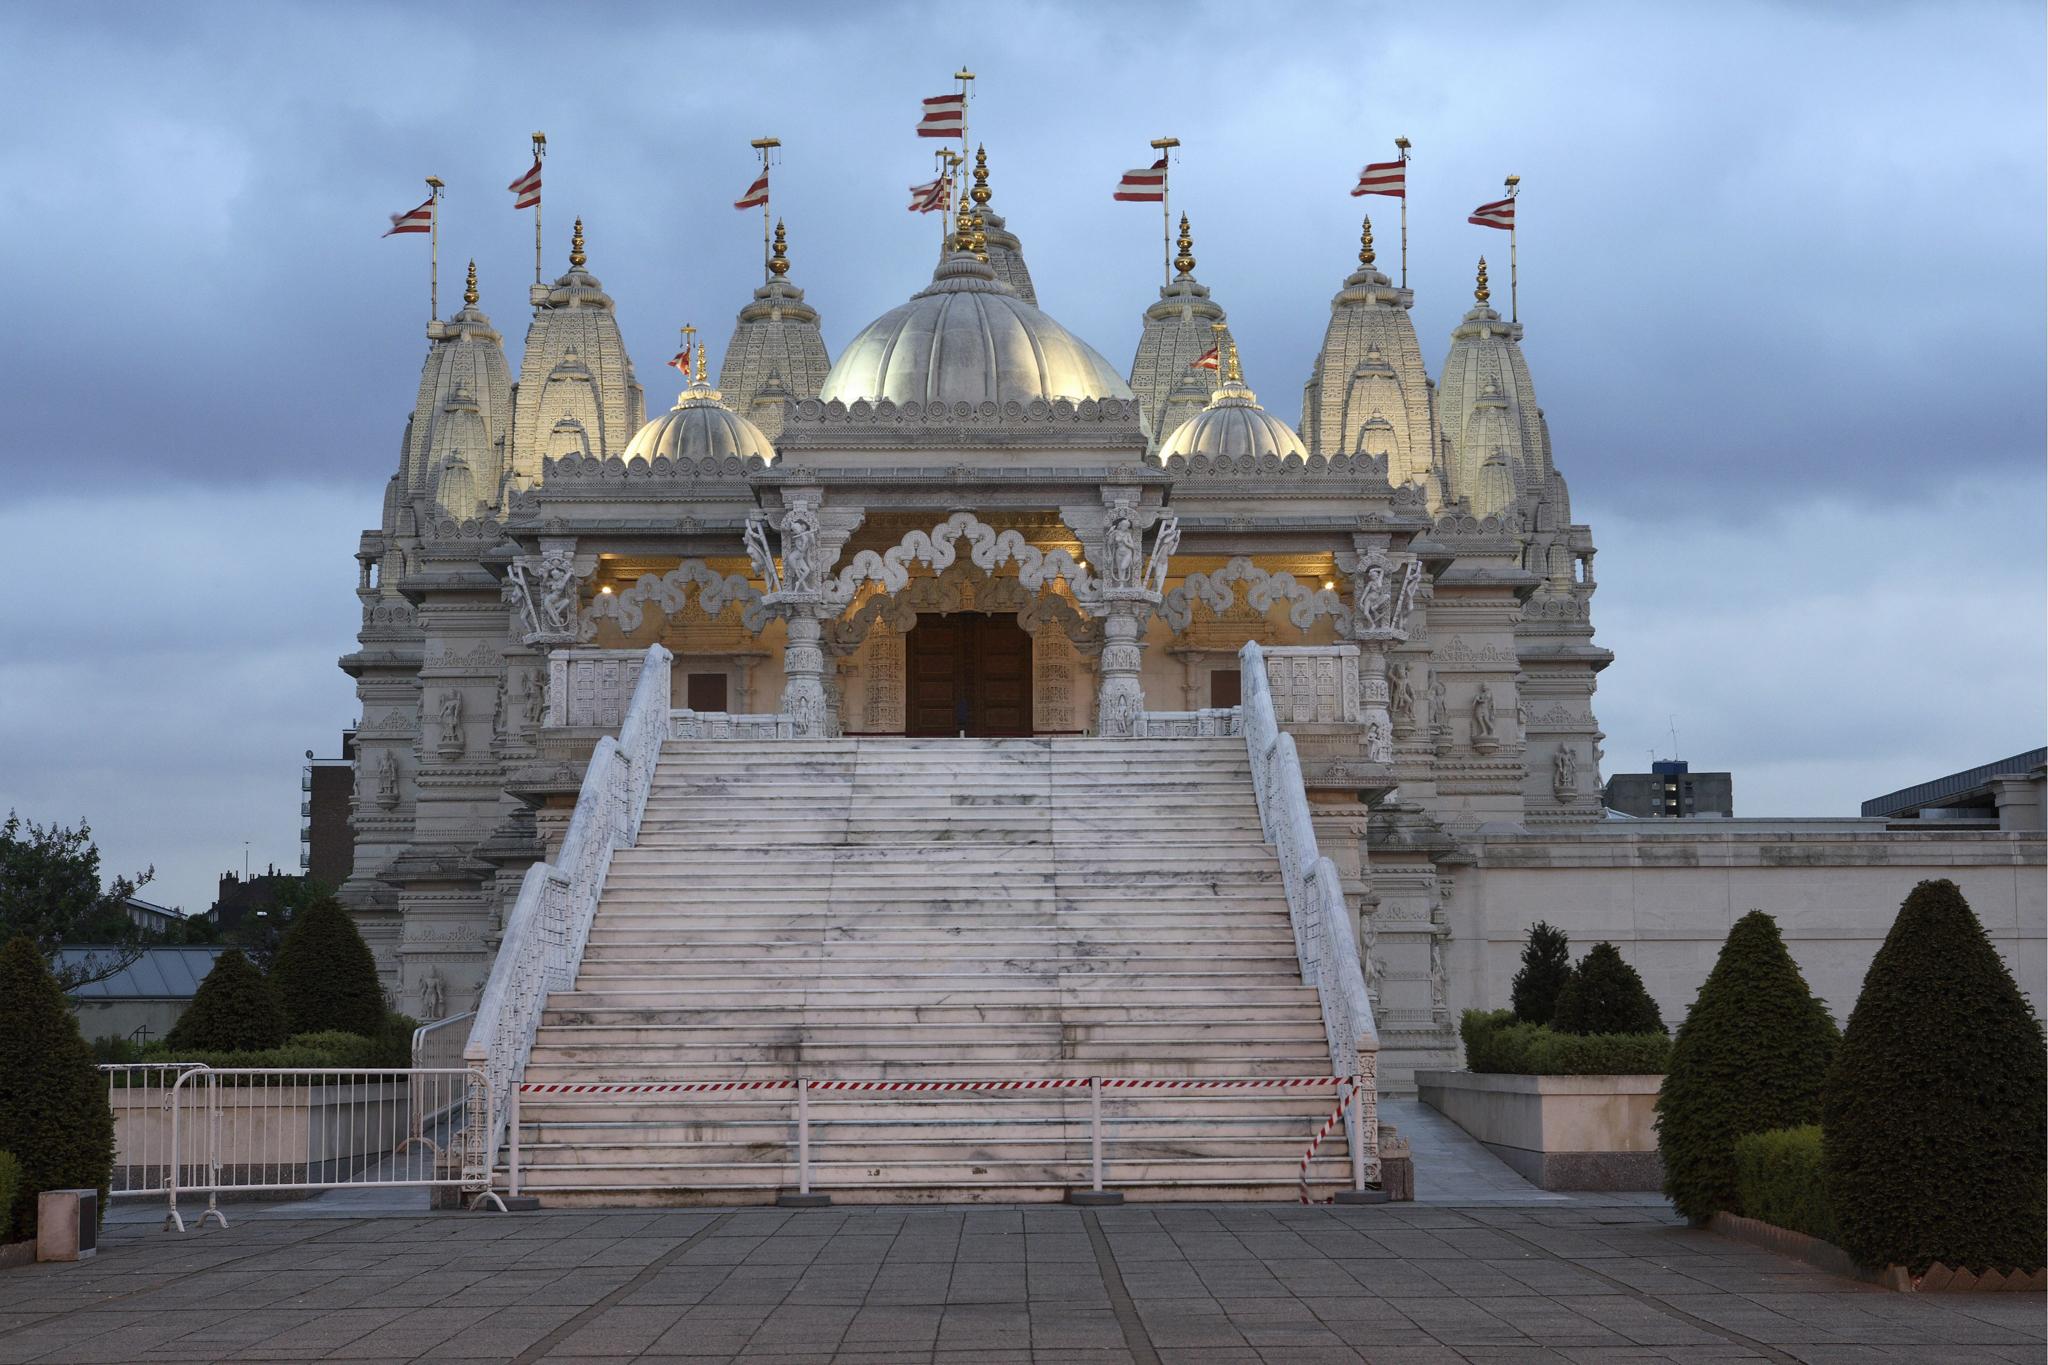 Neasden Temple, BAPS Shri Swaminarayan Mandir